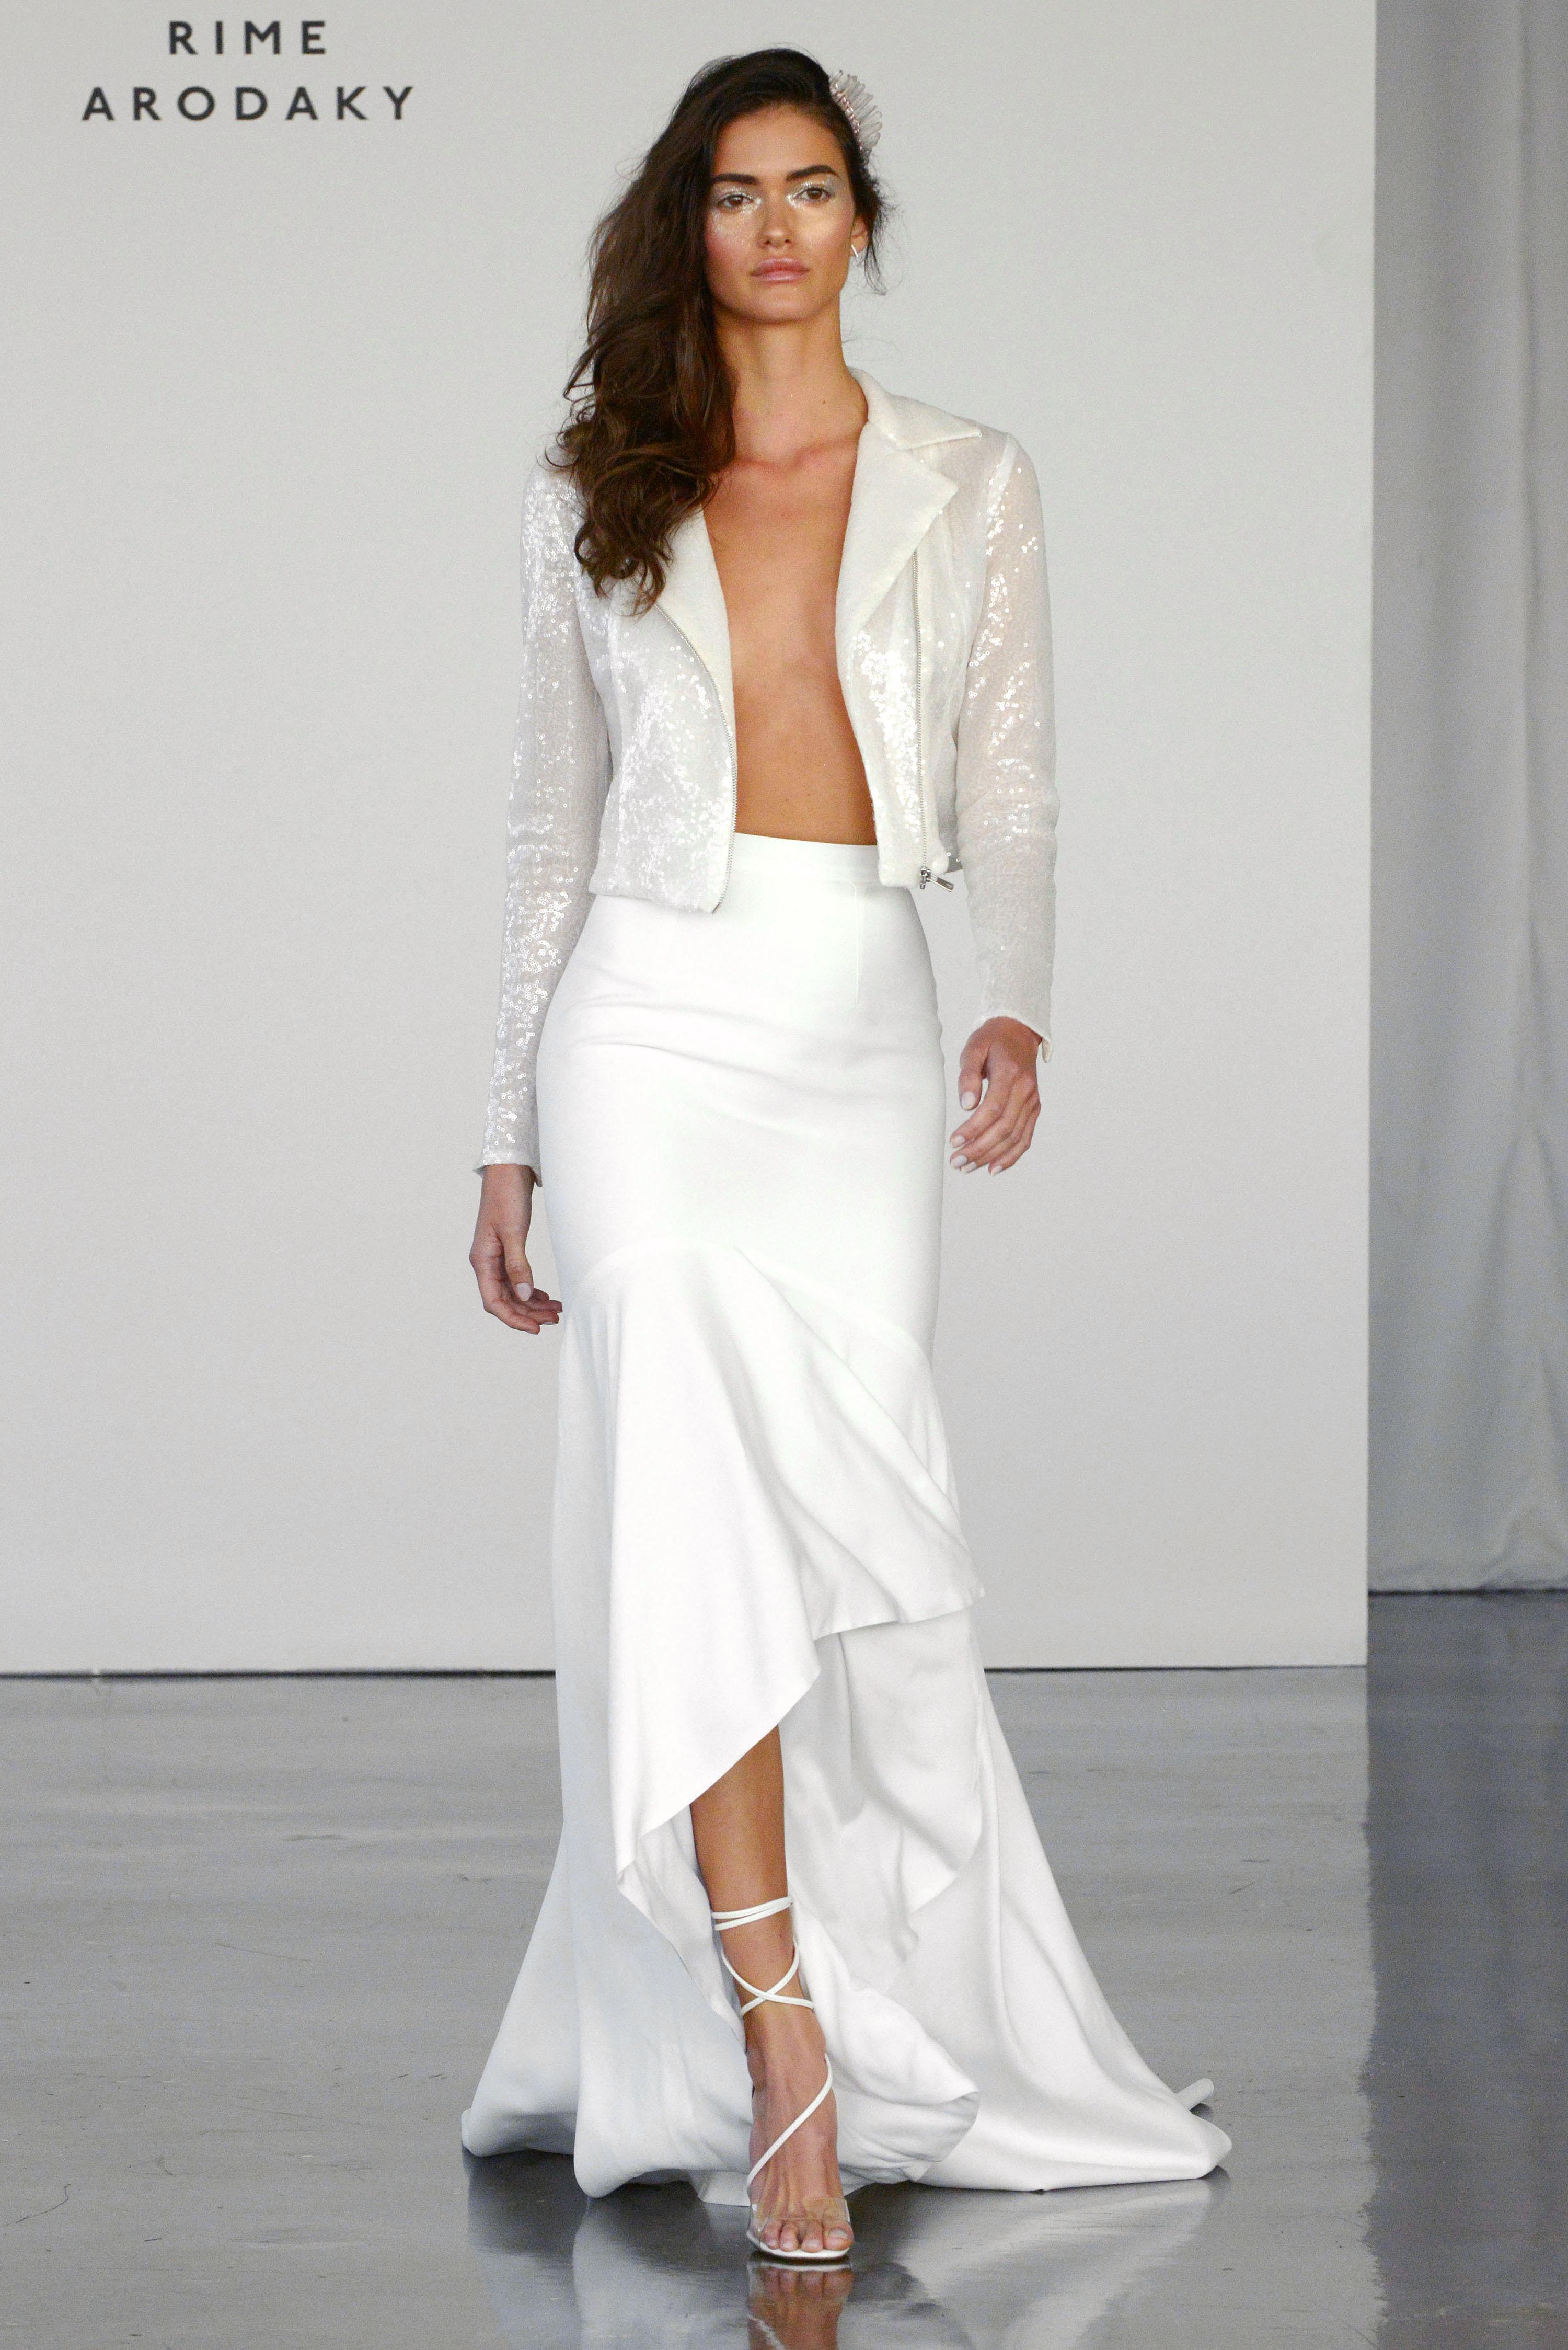 Rime Arodaky wedding dress 26 Fall 2017